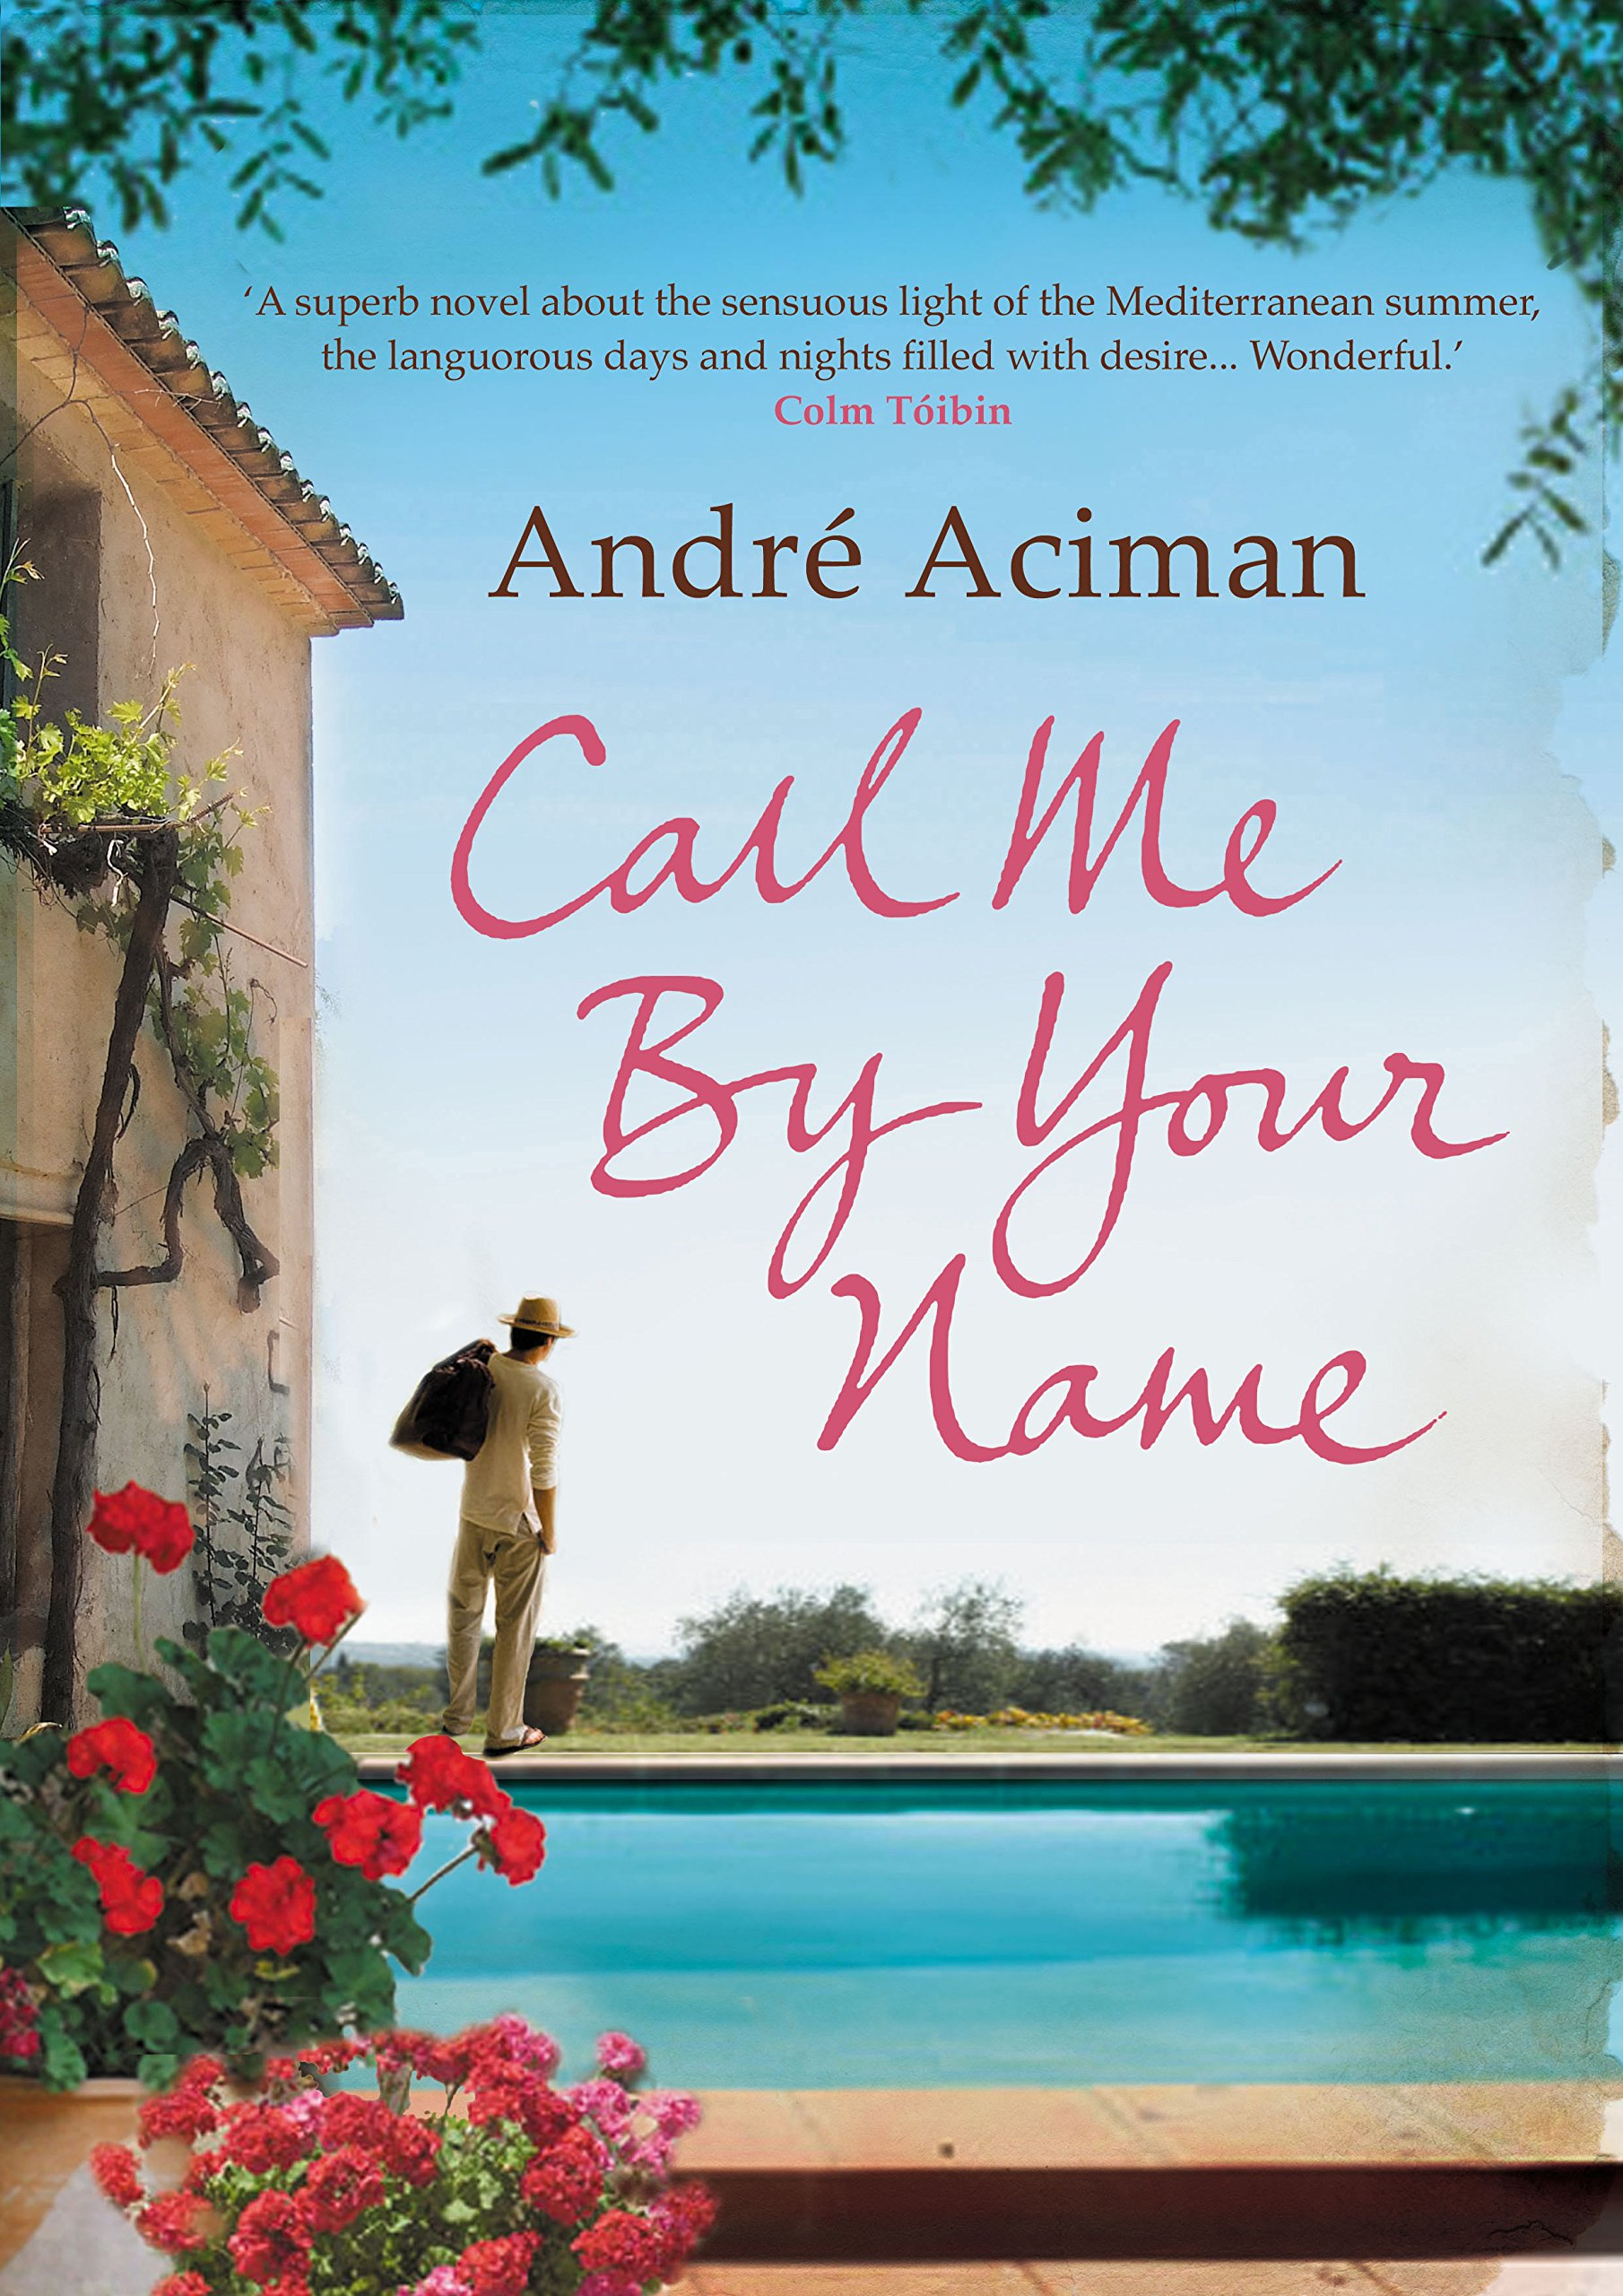 Call Me By Your Name: Amazon.es: Andre Aciman: Libros en idiomas extranjeros